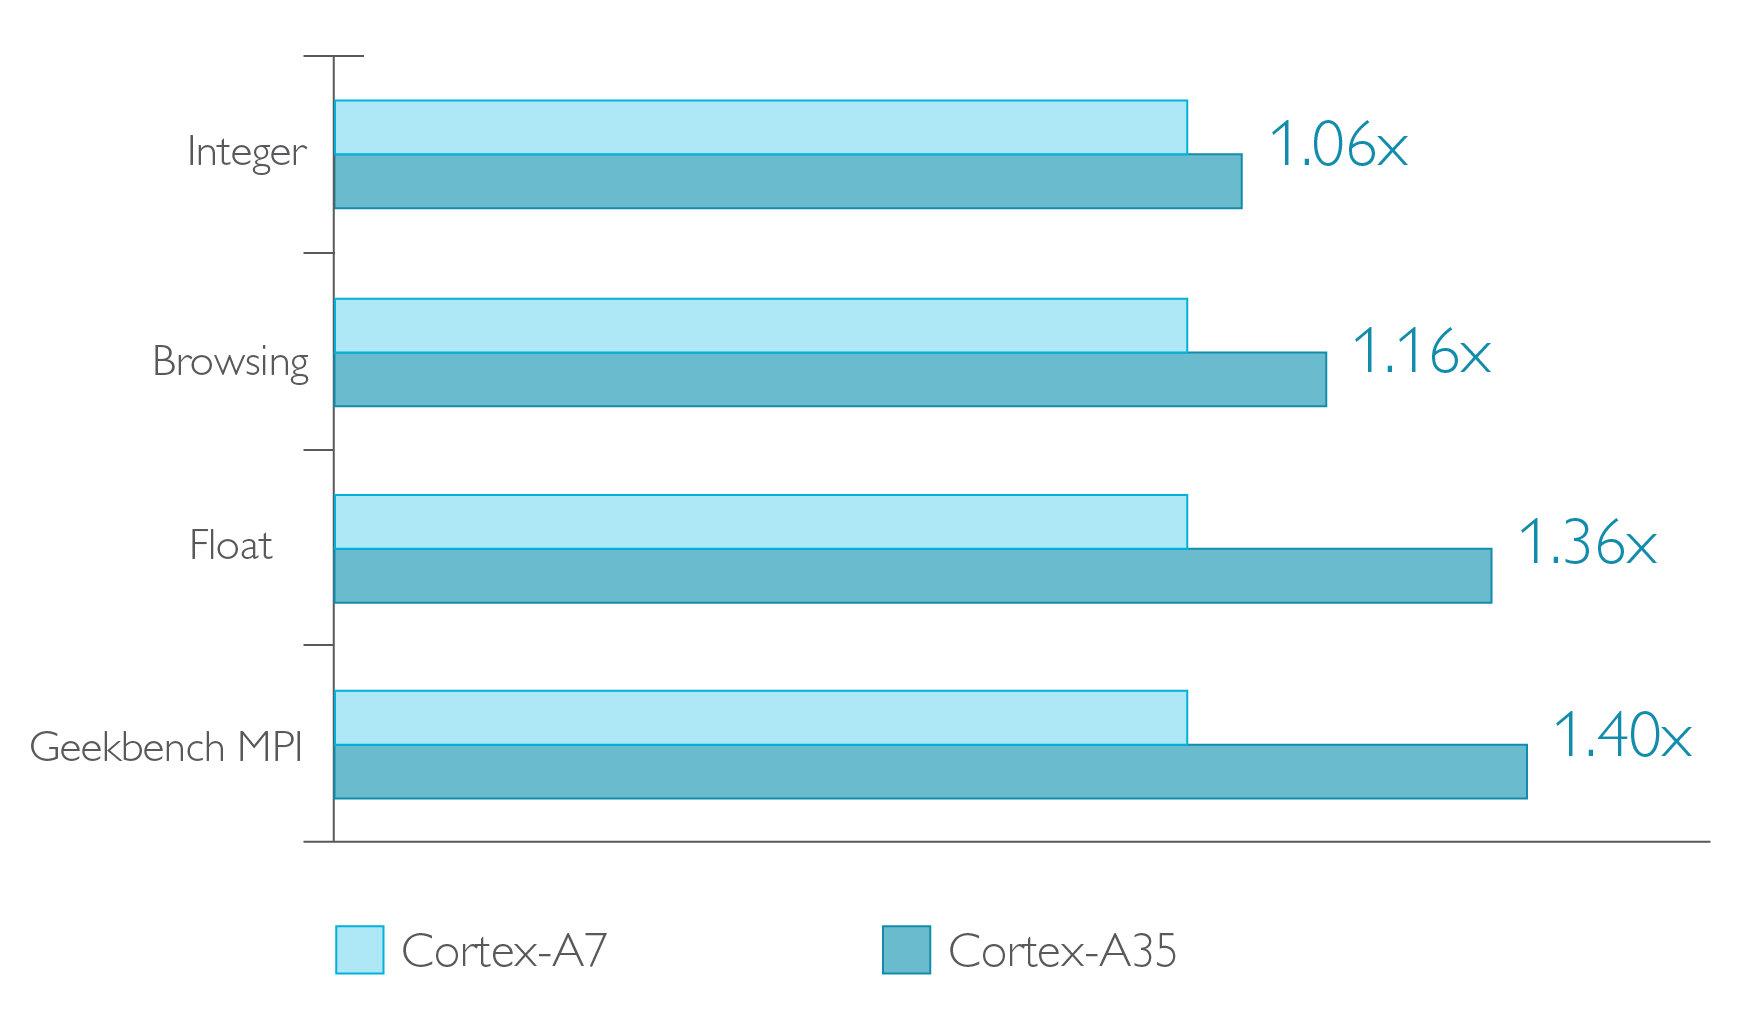 Leistungsvergleich Cortex A7 vs. A35